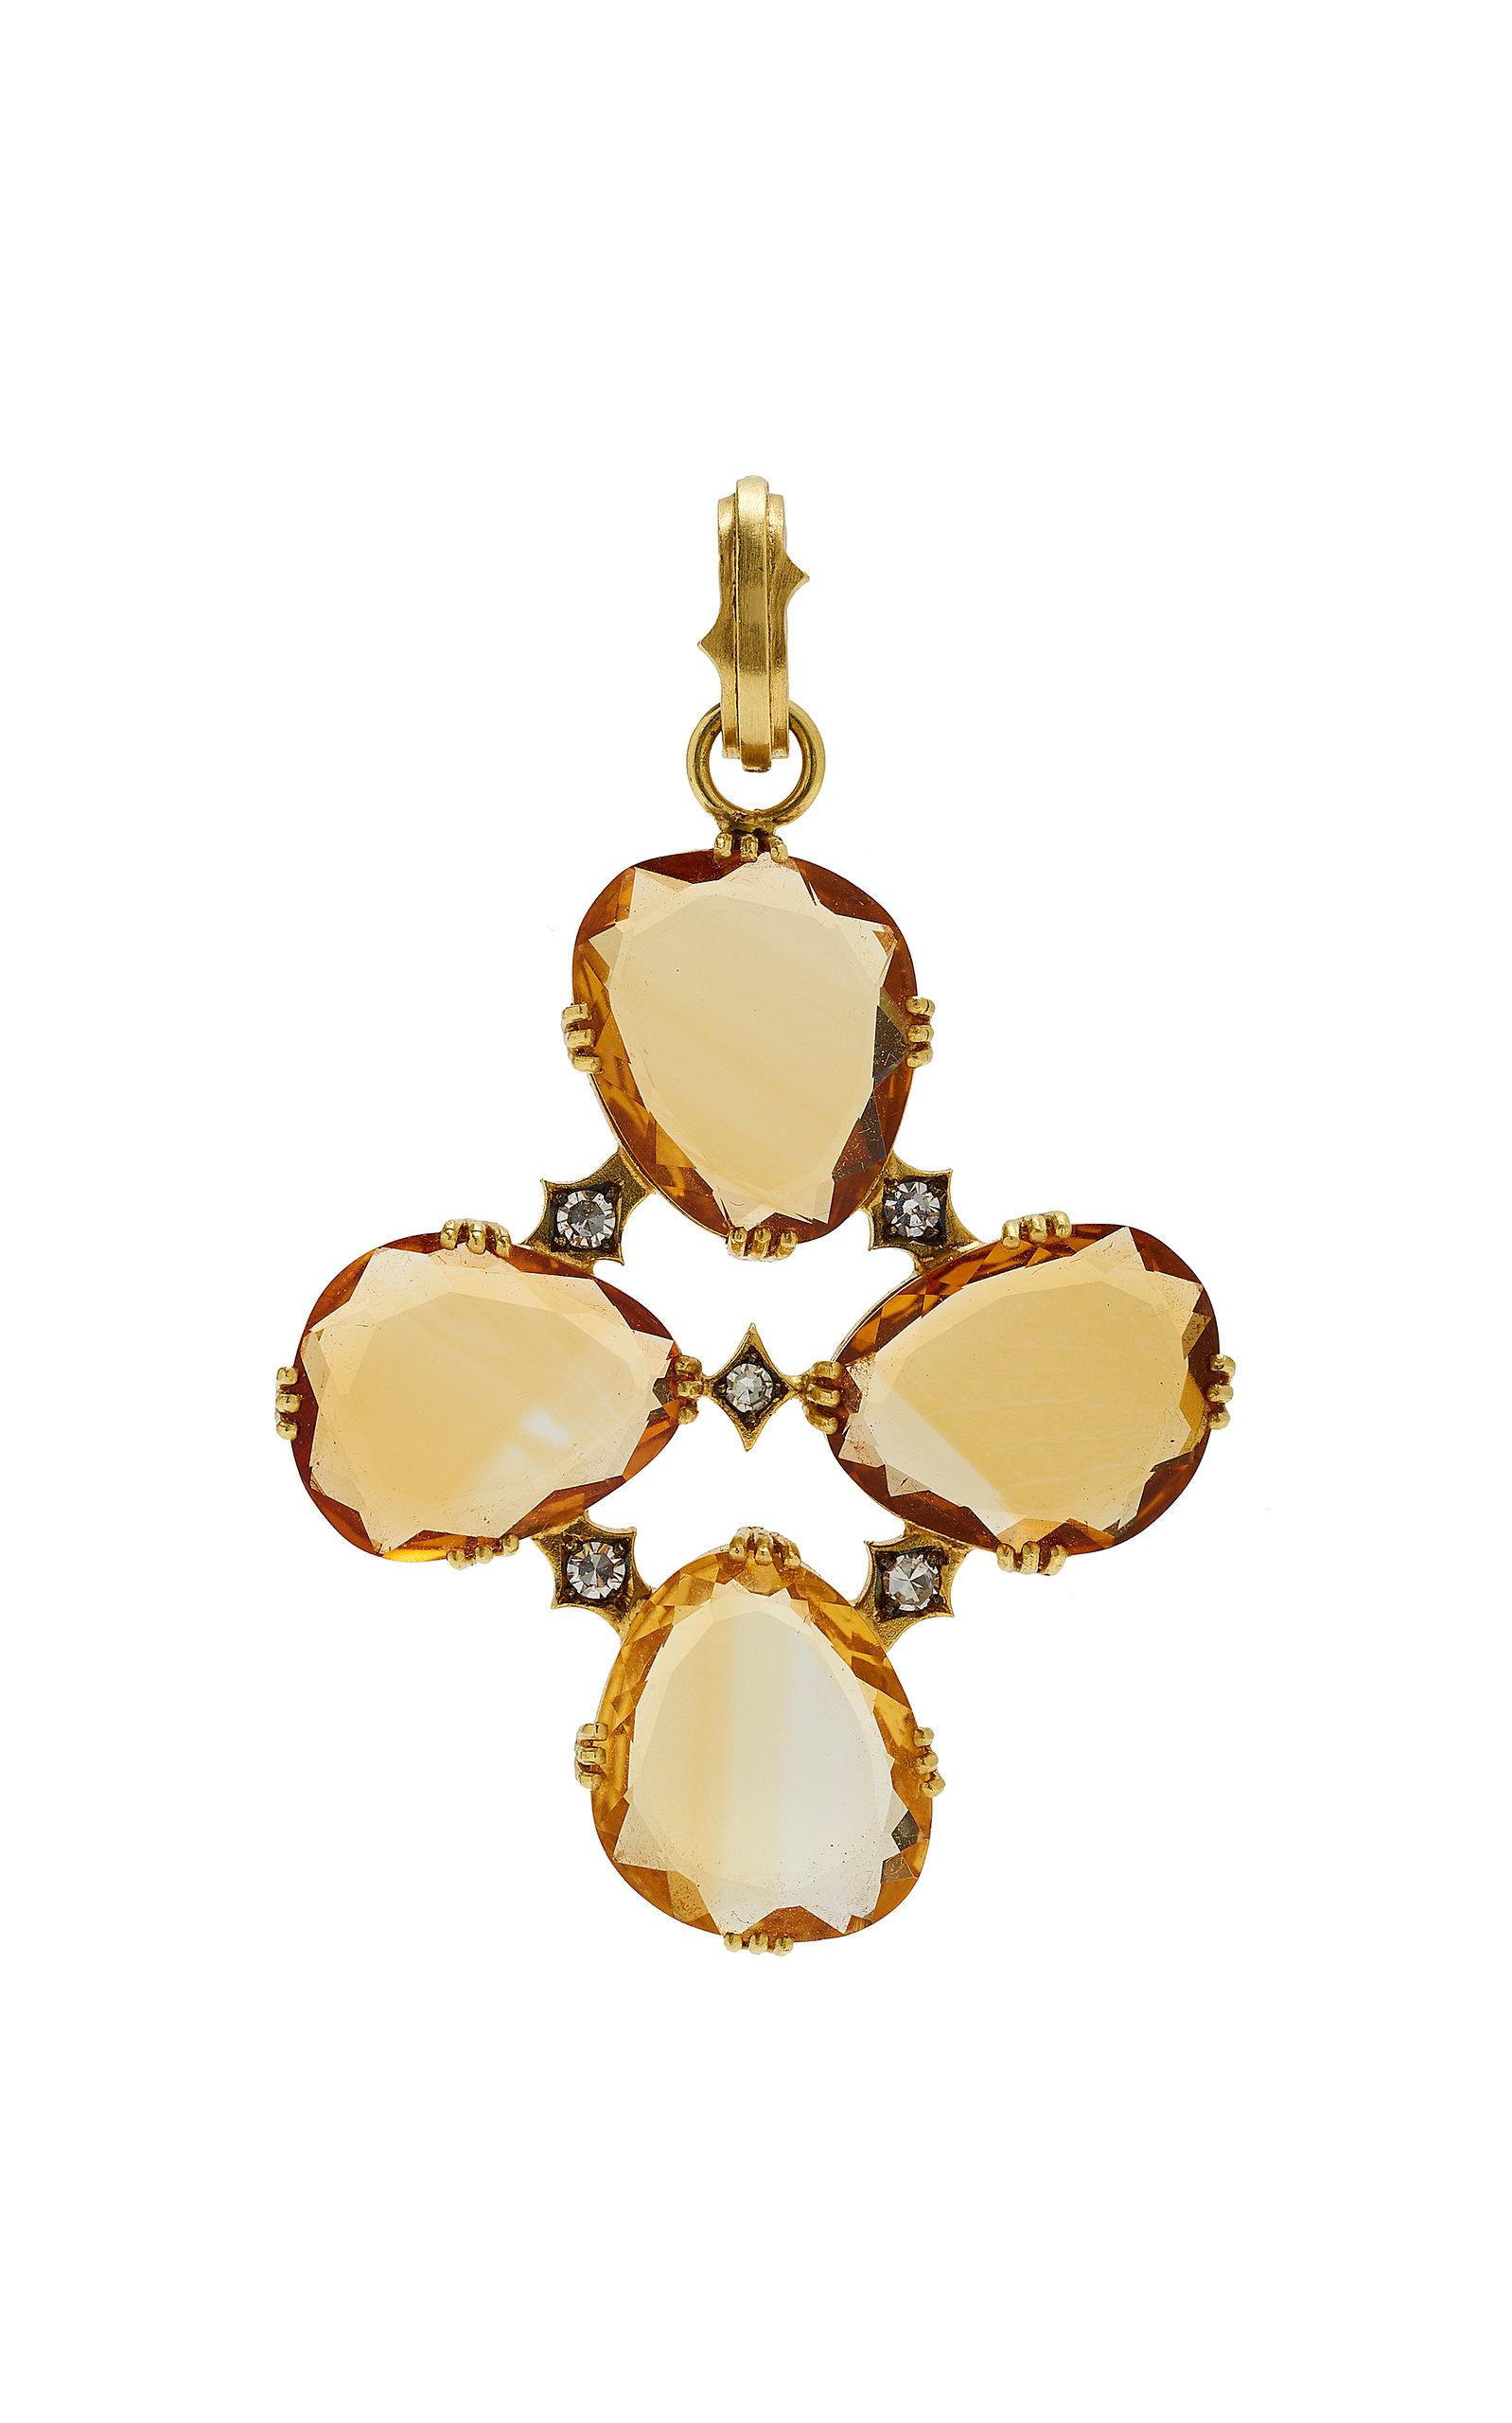 SYLVA & CIE 18K Gold Citrine And Diamond Charm in Yellow